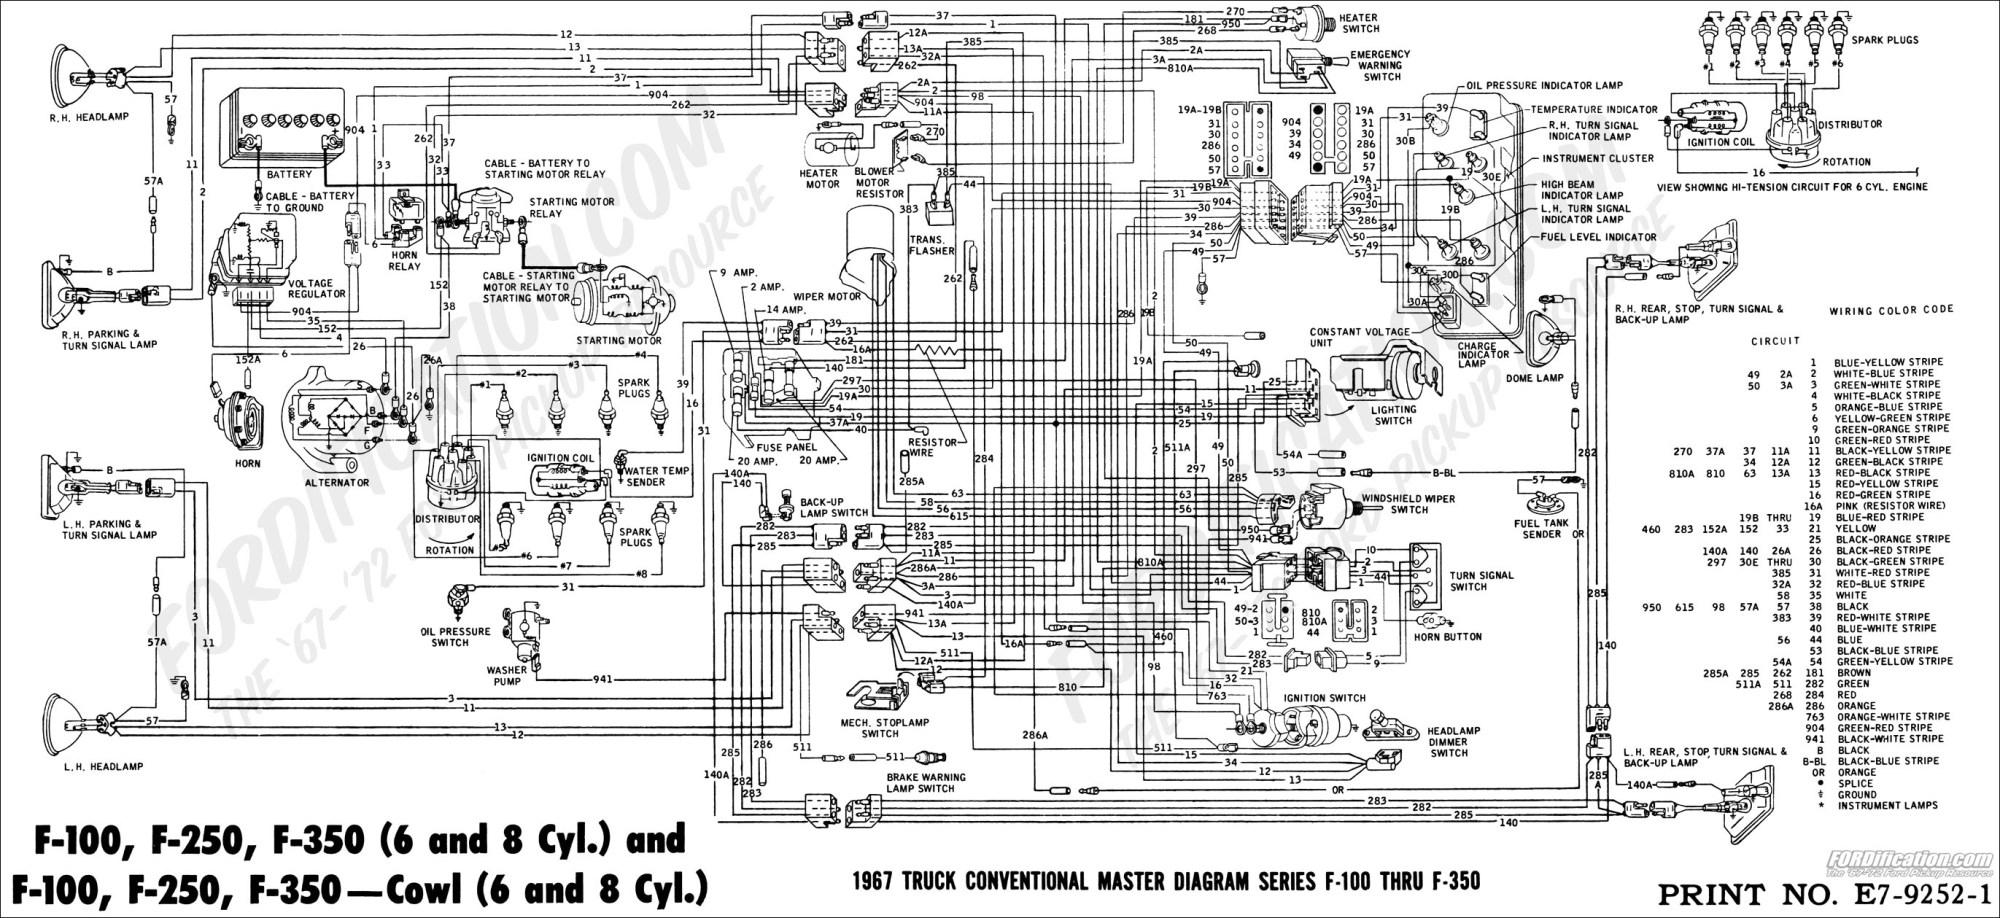 hight resolution of 1988 ford truck cab foldout wiring diagram original f600 f700 rh ssl forum com